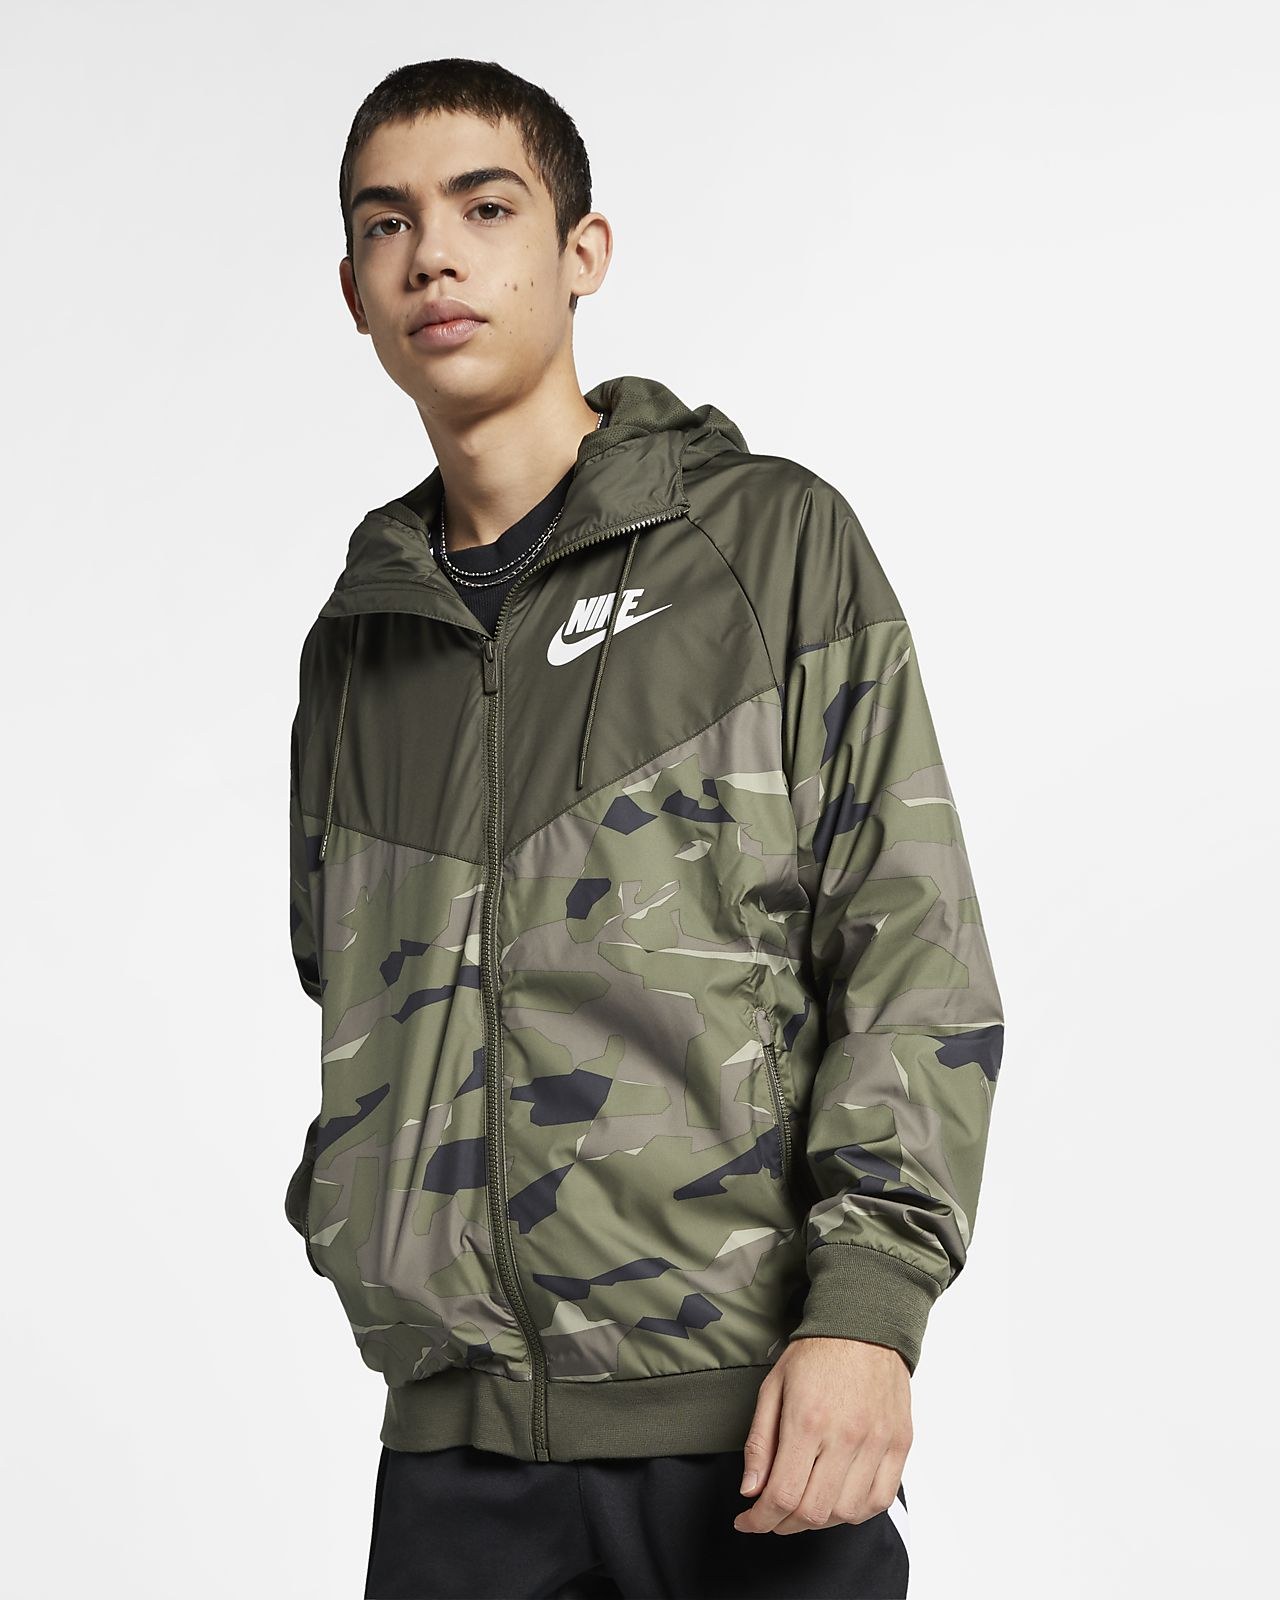 Nike It Giacca Uomo Camo Sportswear Windrunner wFp7qp1